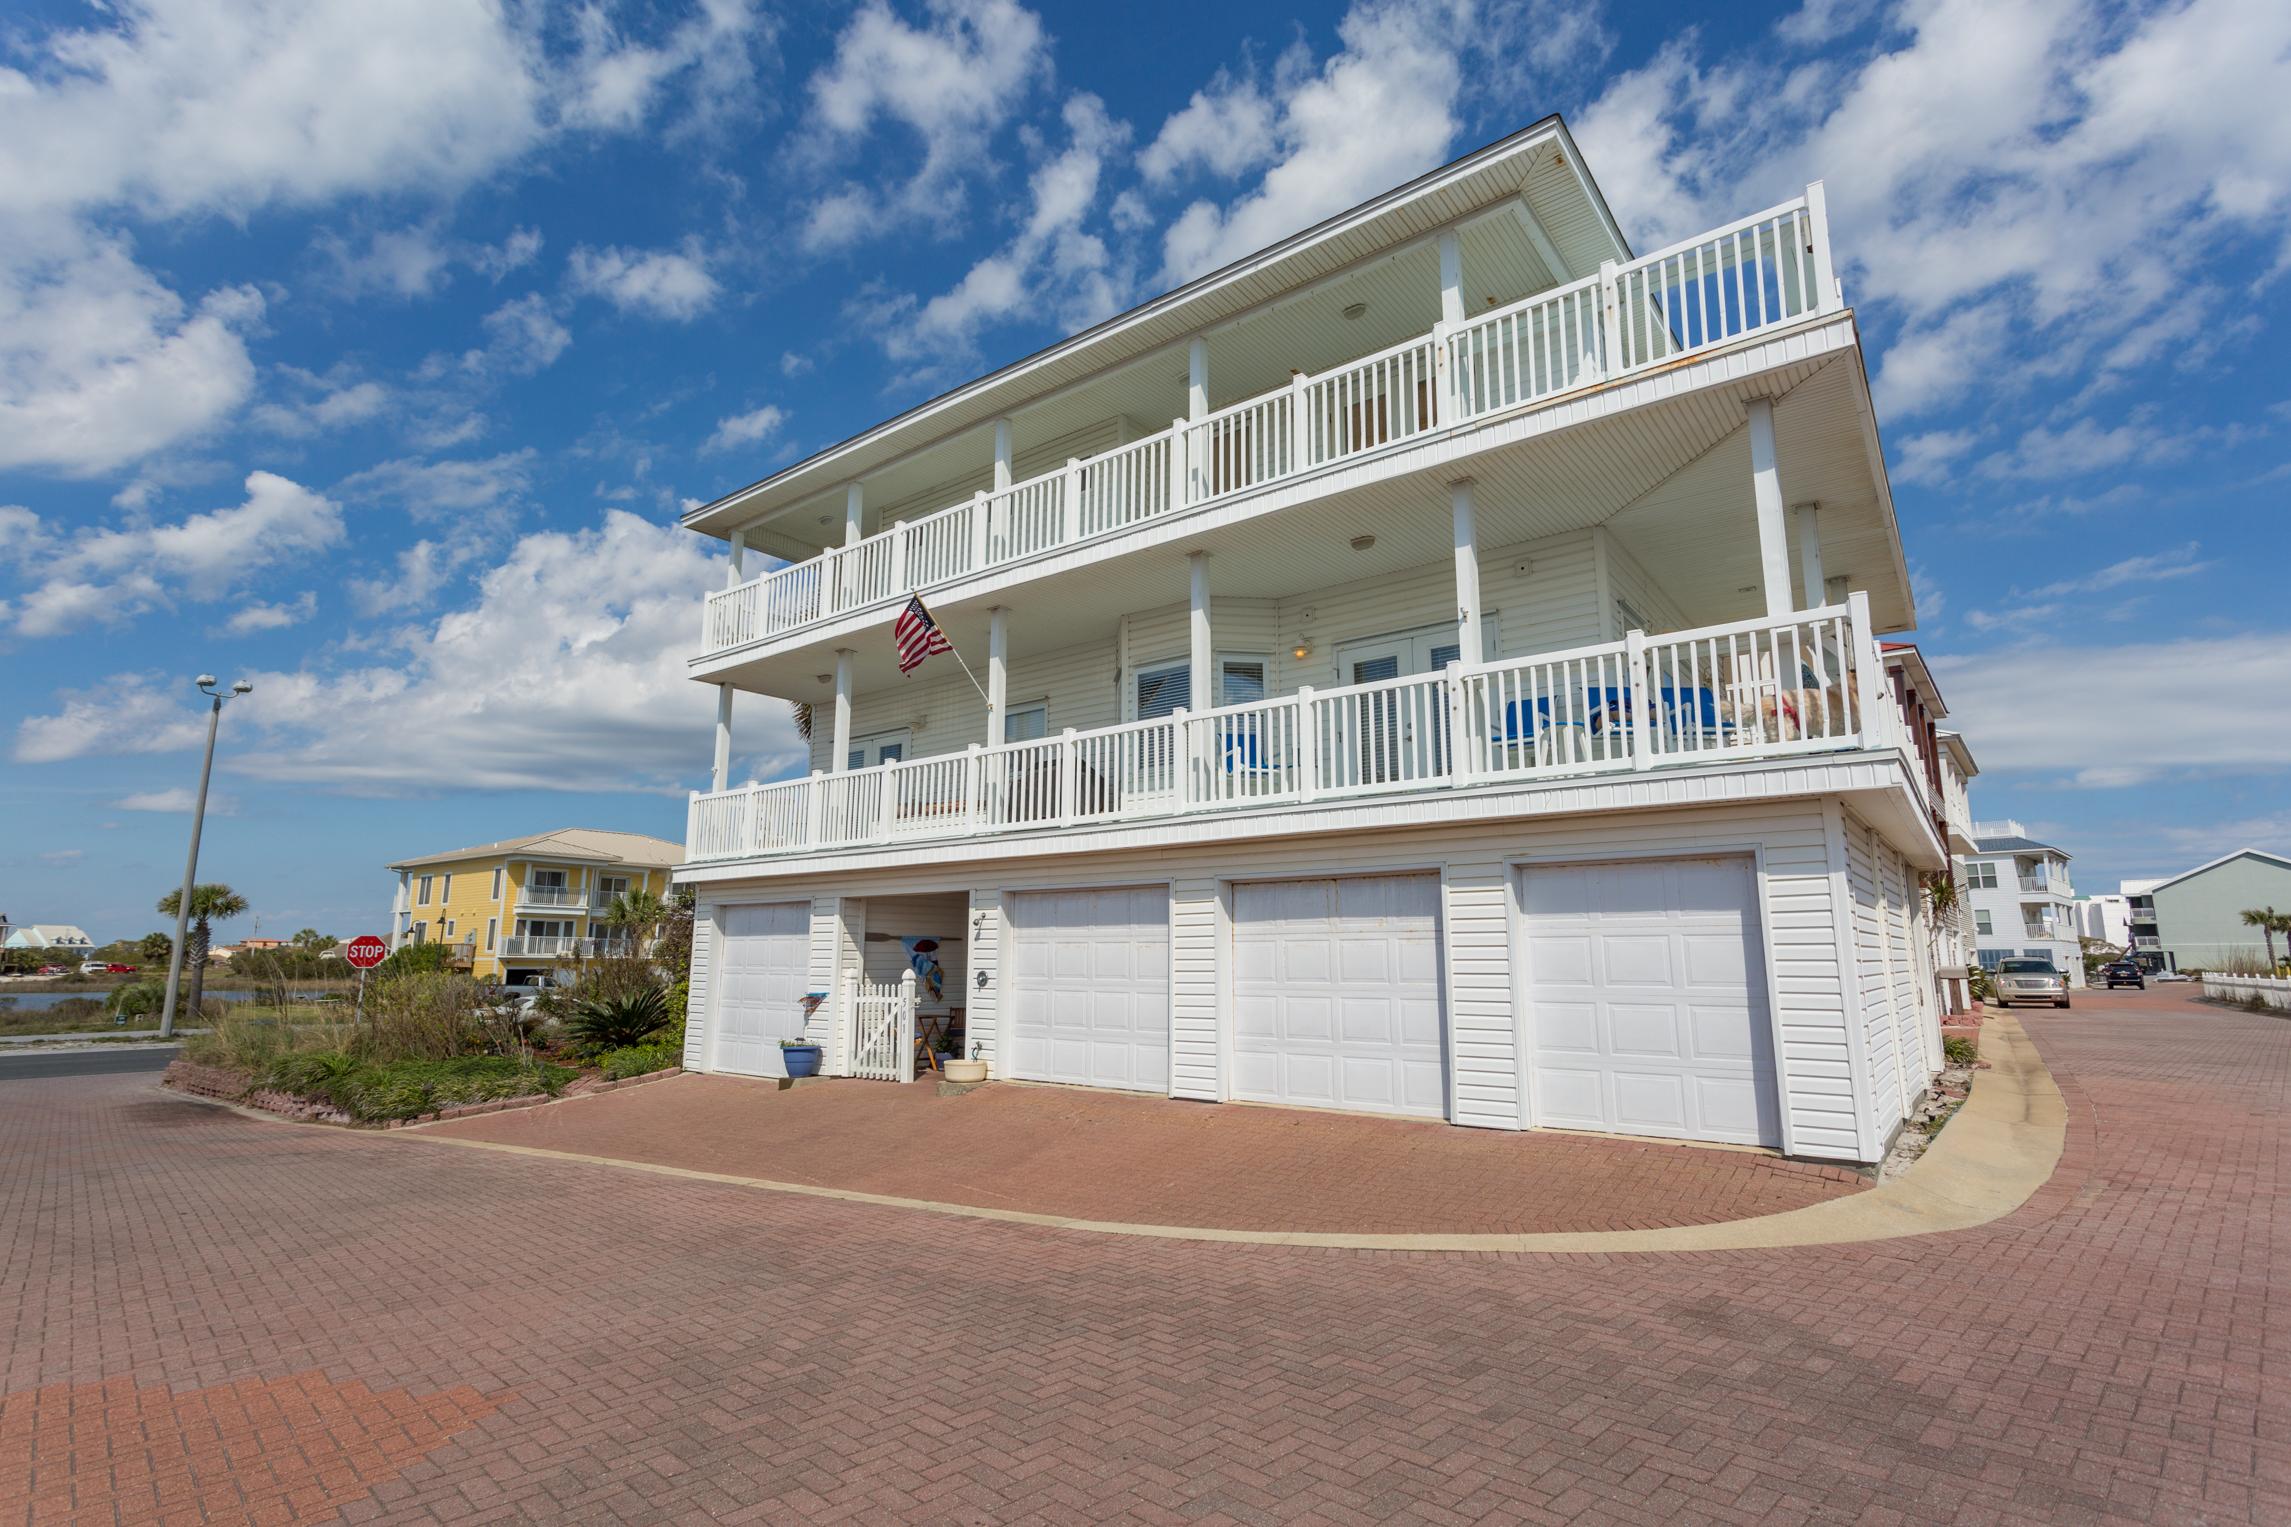 White Sands Cottage 501 Life's a Beach House Townhouse rental in White Sands Pensacola Beach in Pensacola Beach Florida - #43